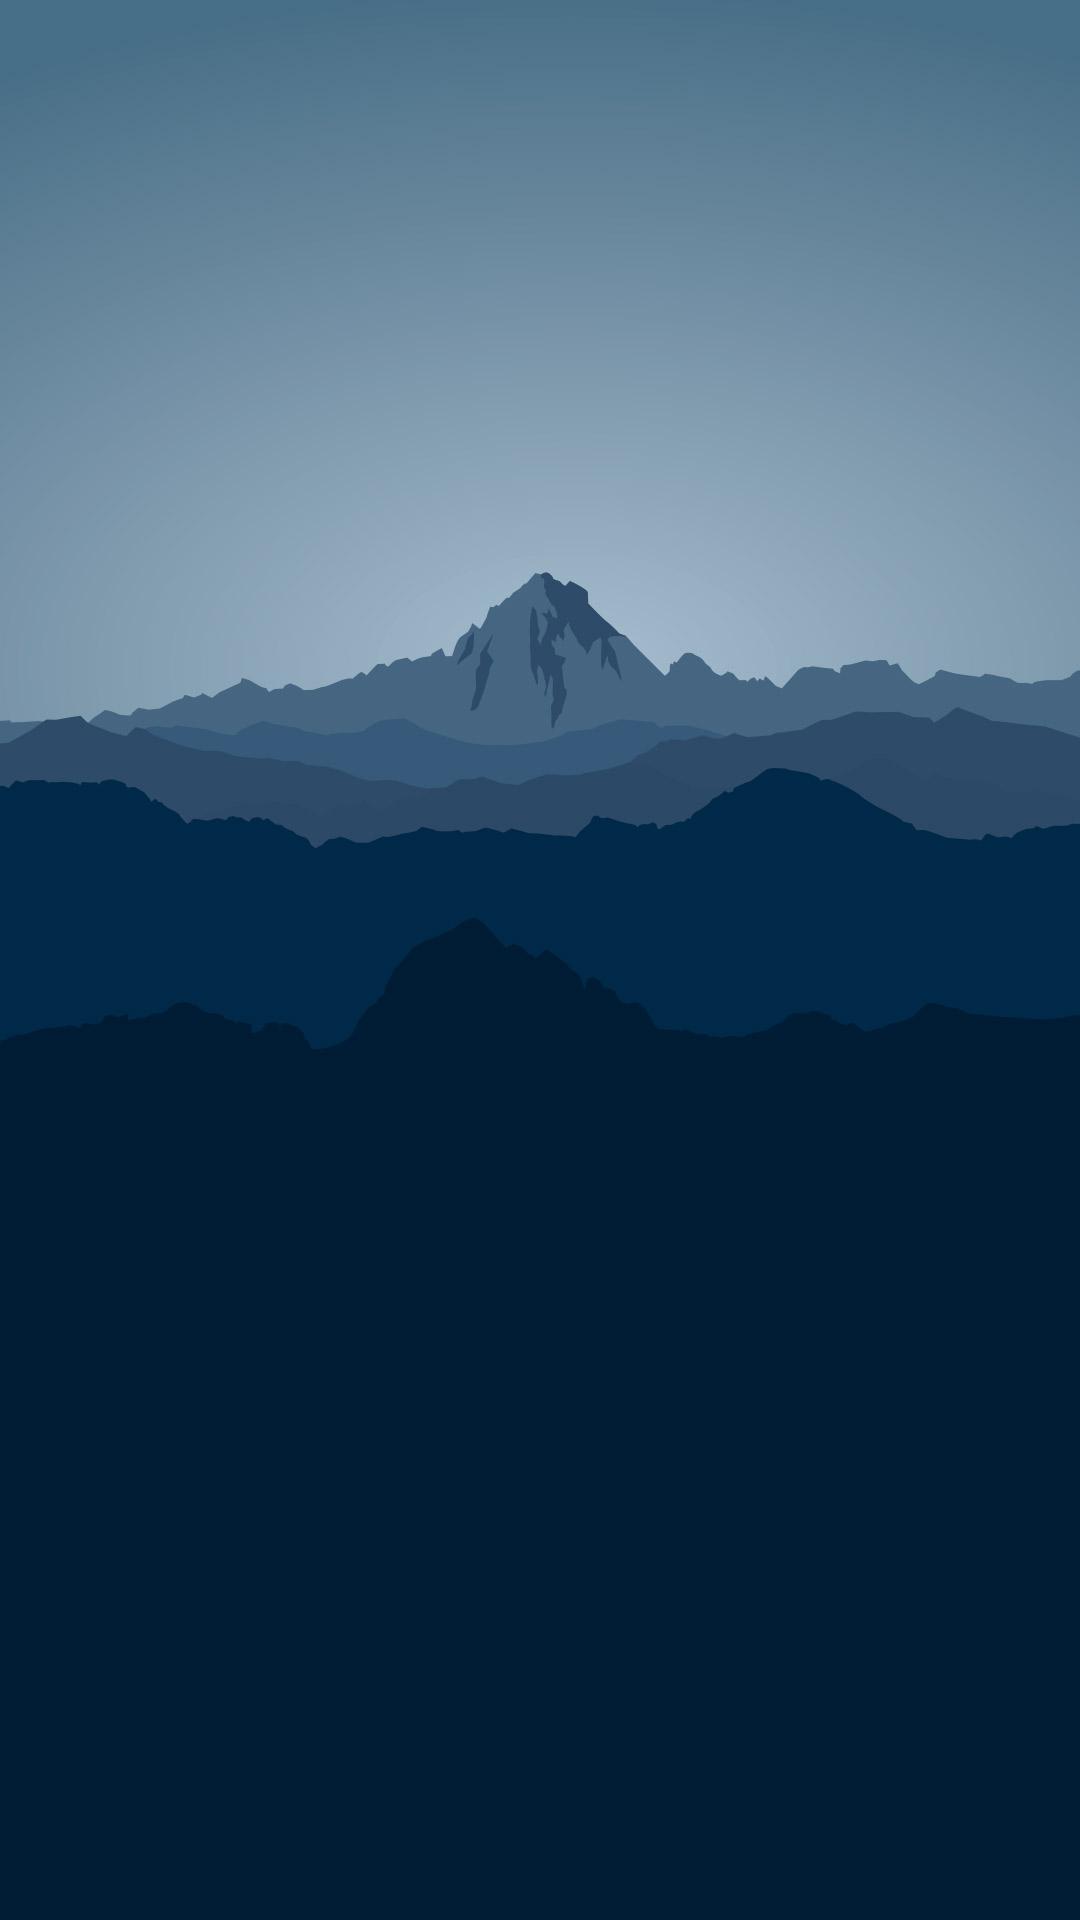 Top Wallpaper Mountain Blue - Marmotamaps_Wallpaper_MonteViso_Smartphone_1080x1920  Collection_249369.jpg